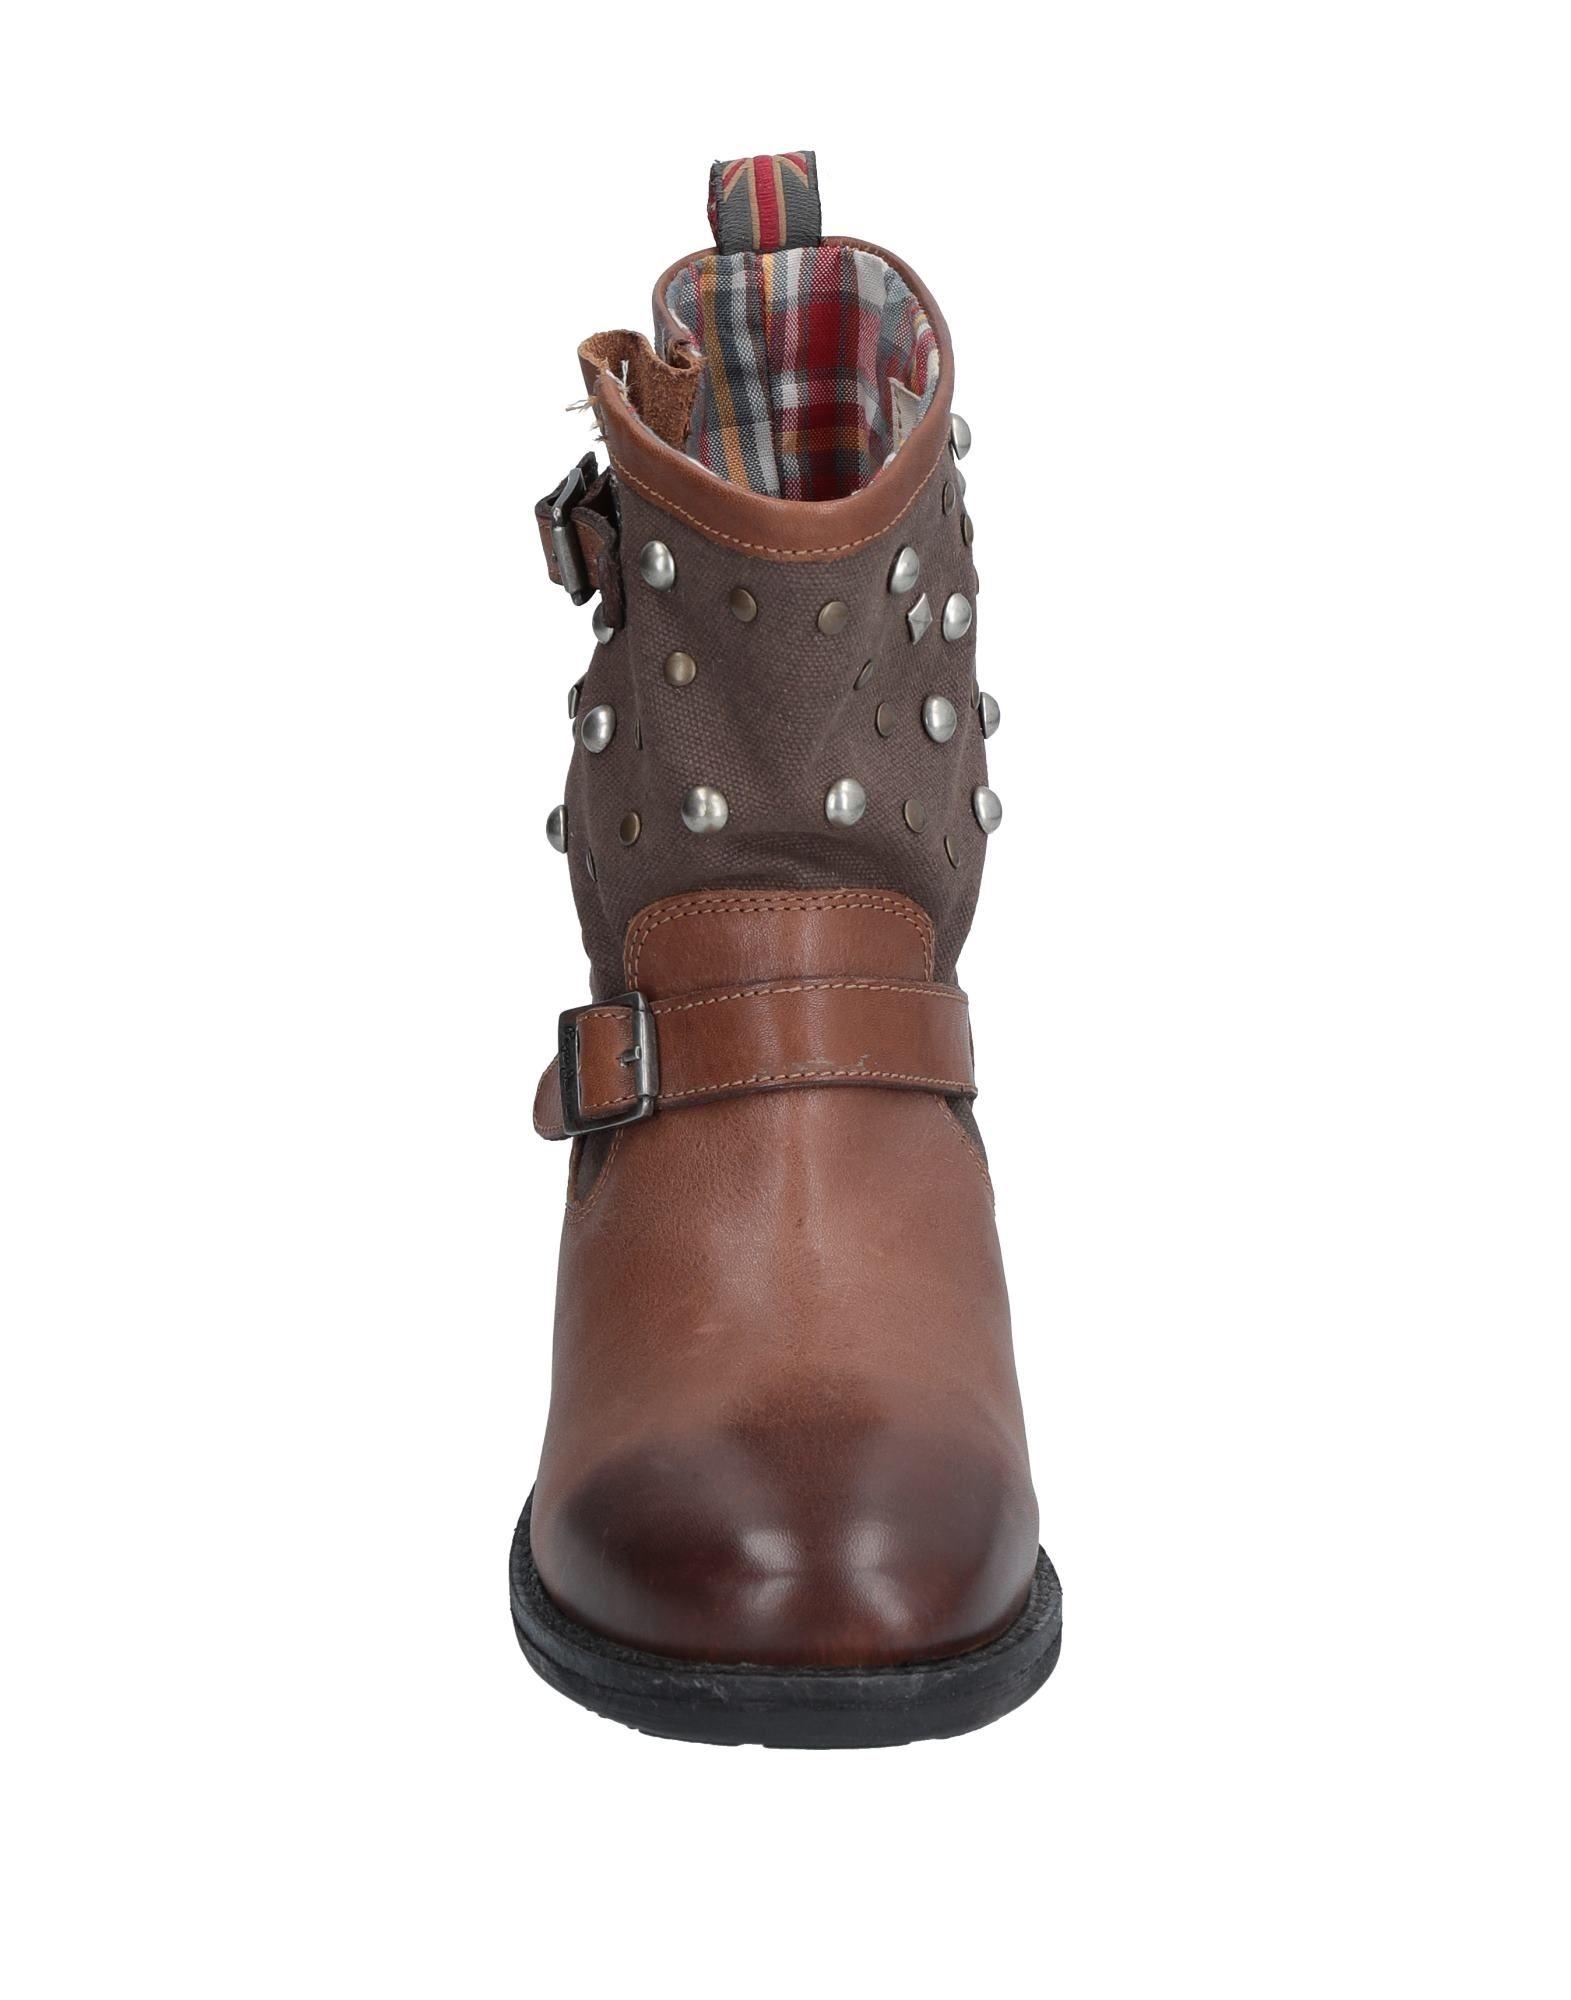 Pepe Jeans Stiefelette Damen  11539060PP Gute Qualität beliebte Schuhe